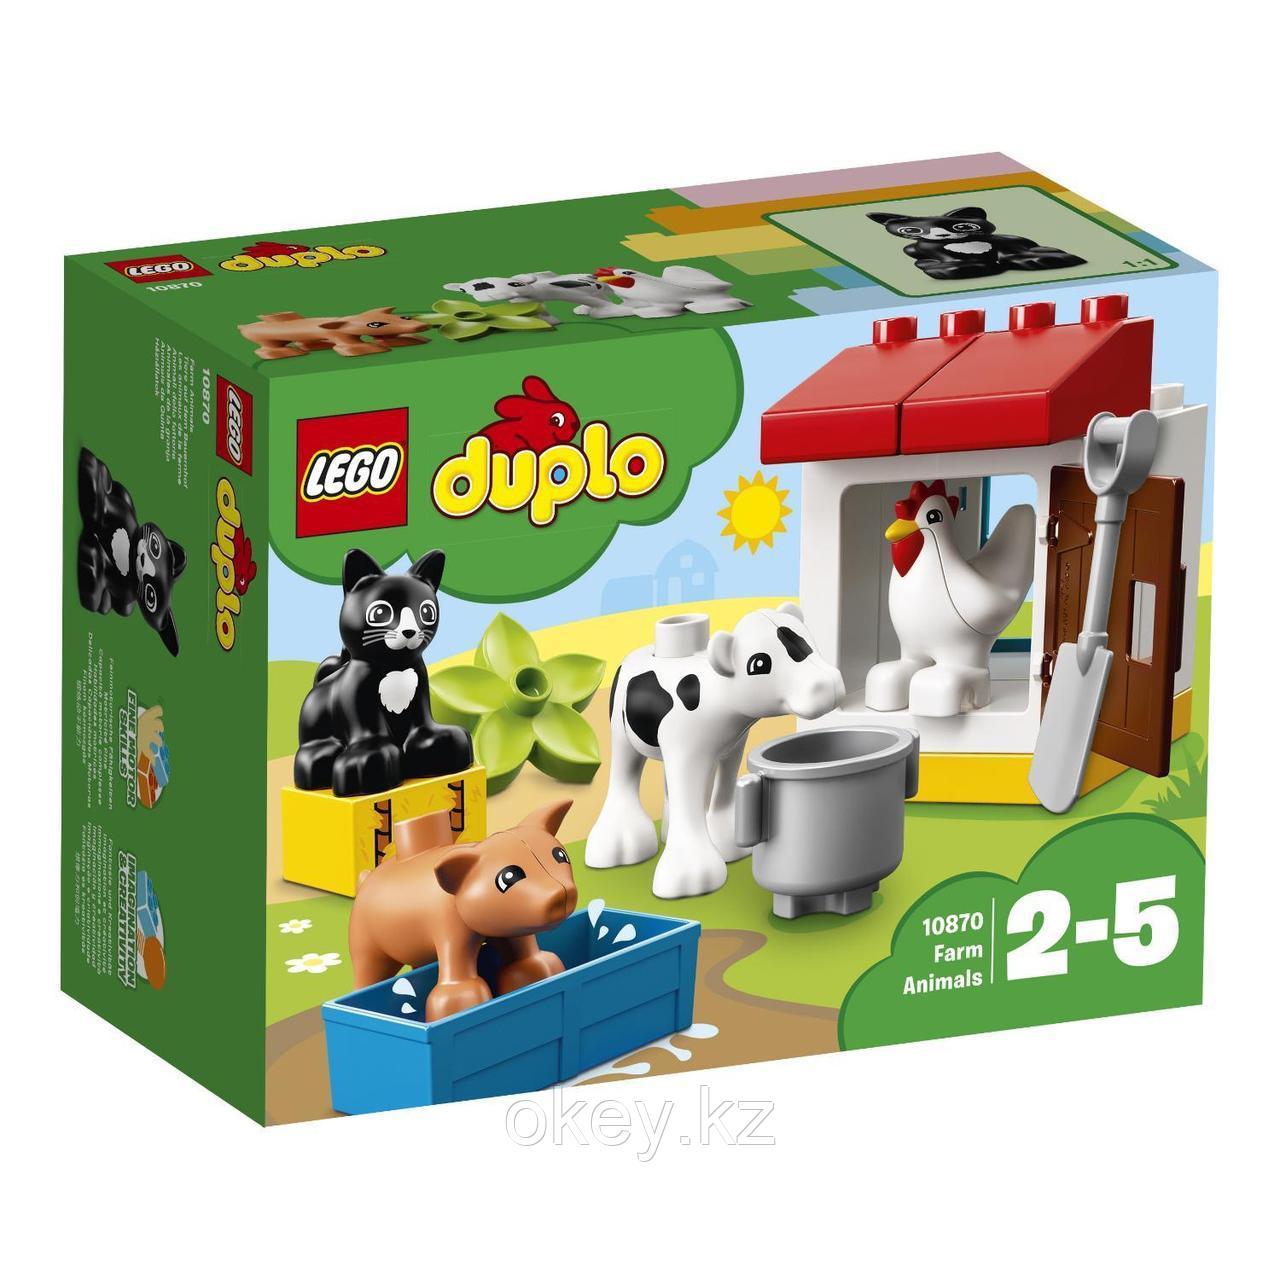 LEGO Duplo: Ферма: Домашние животные 10870